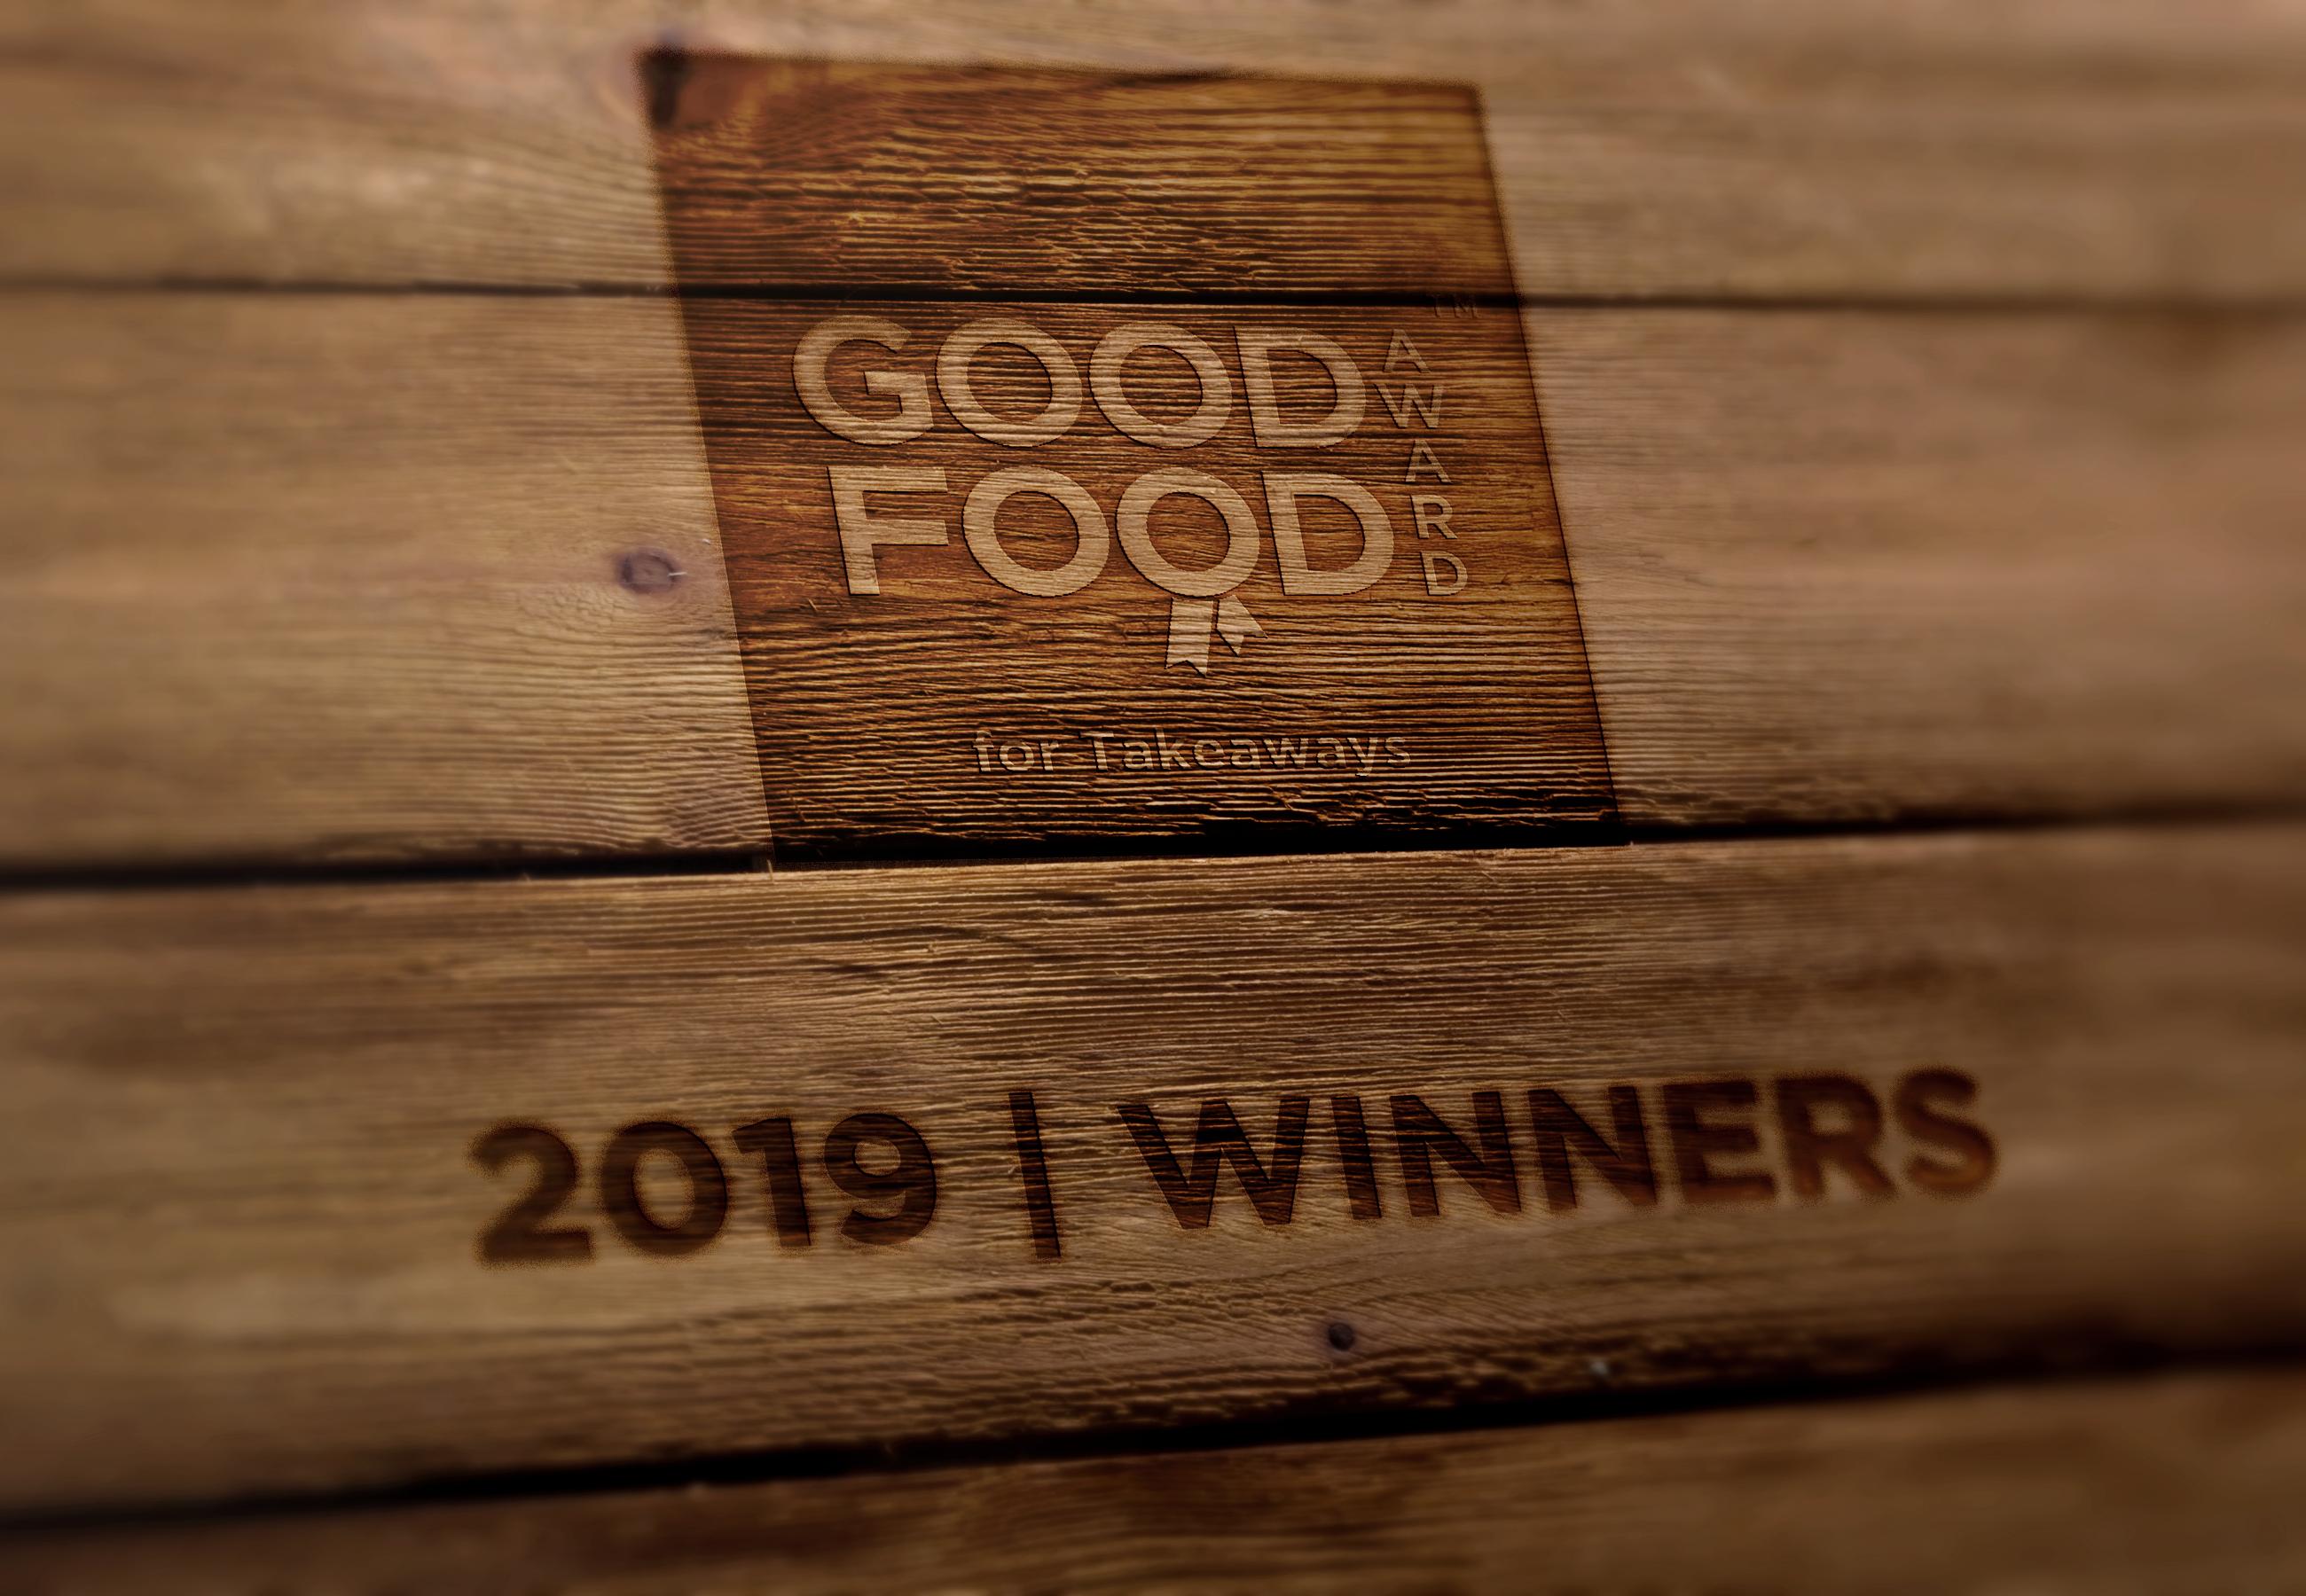 Good Food Award For Takeaways